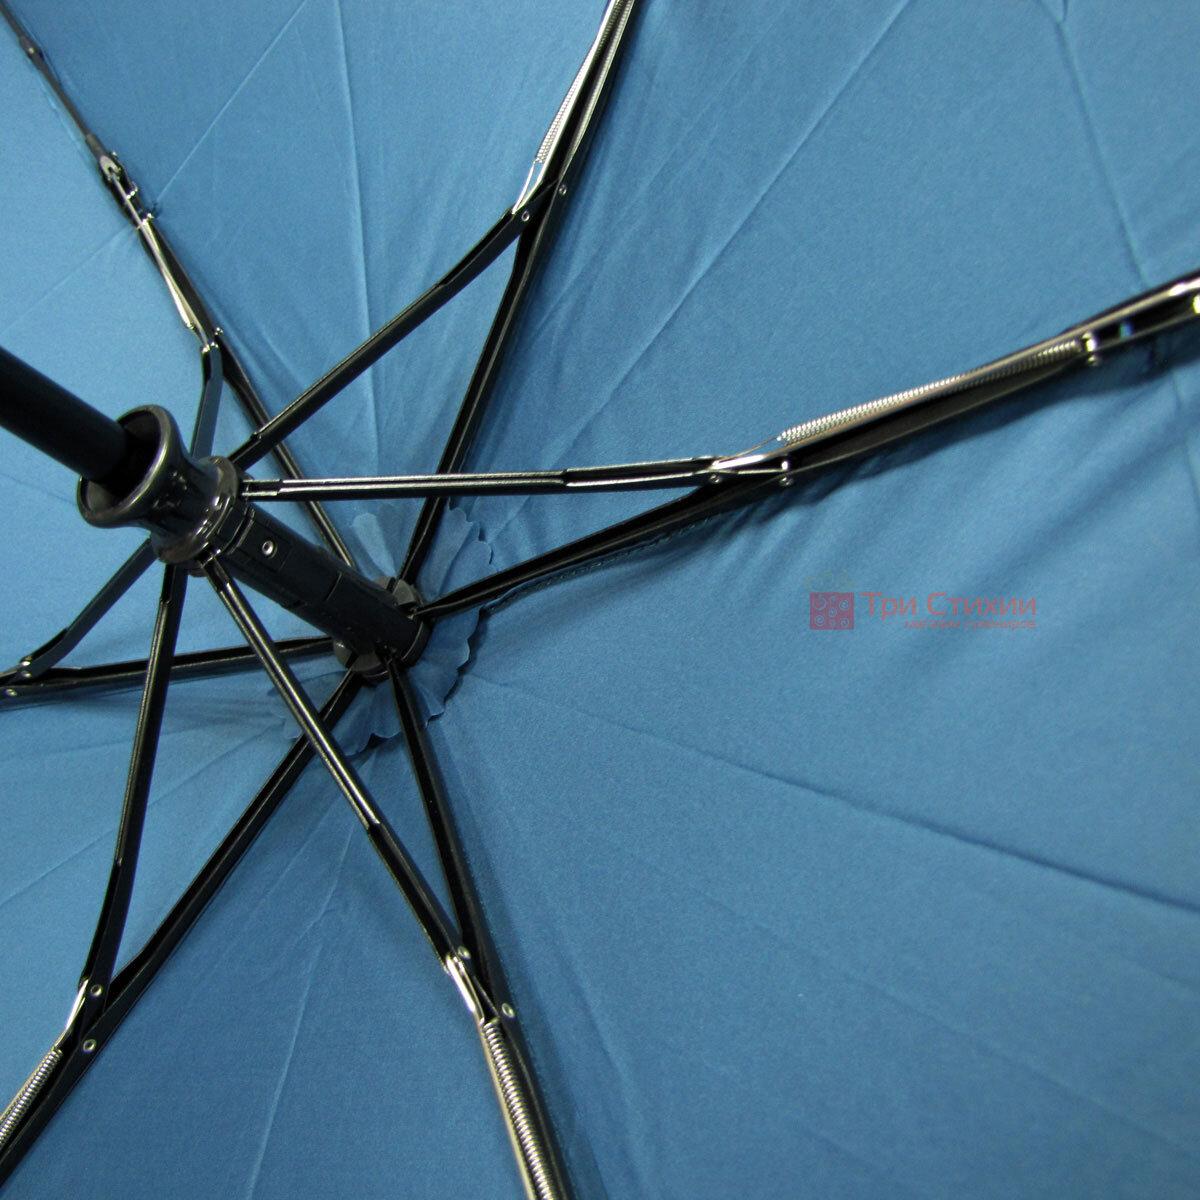 Парасолька складана Doppler ZERO 74456306 повний автомат Блакитна, фото 5